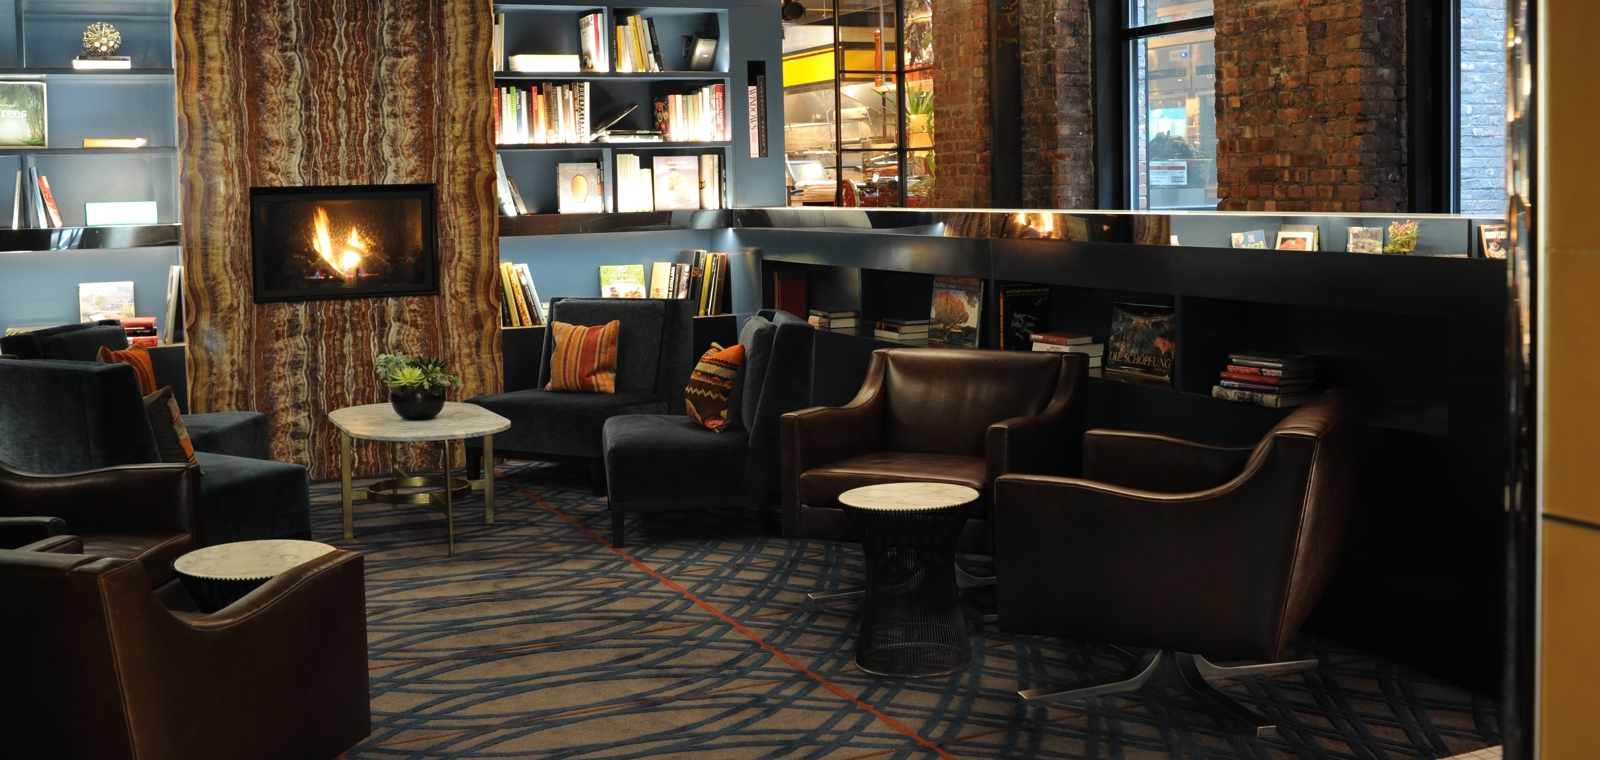 Park South_Interior_Lobby Fireplace